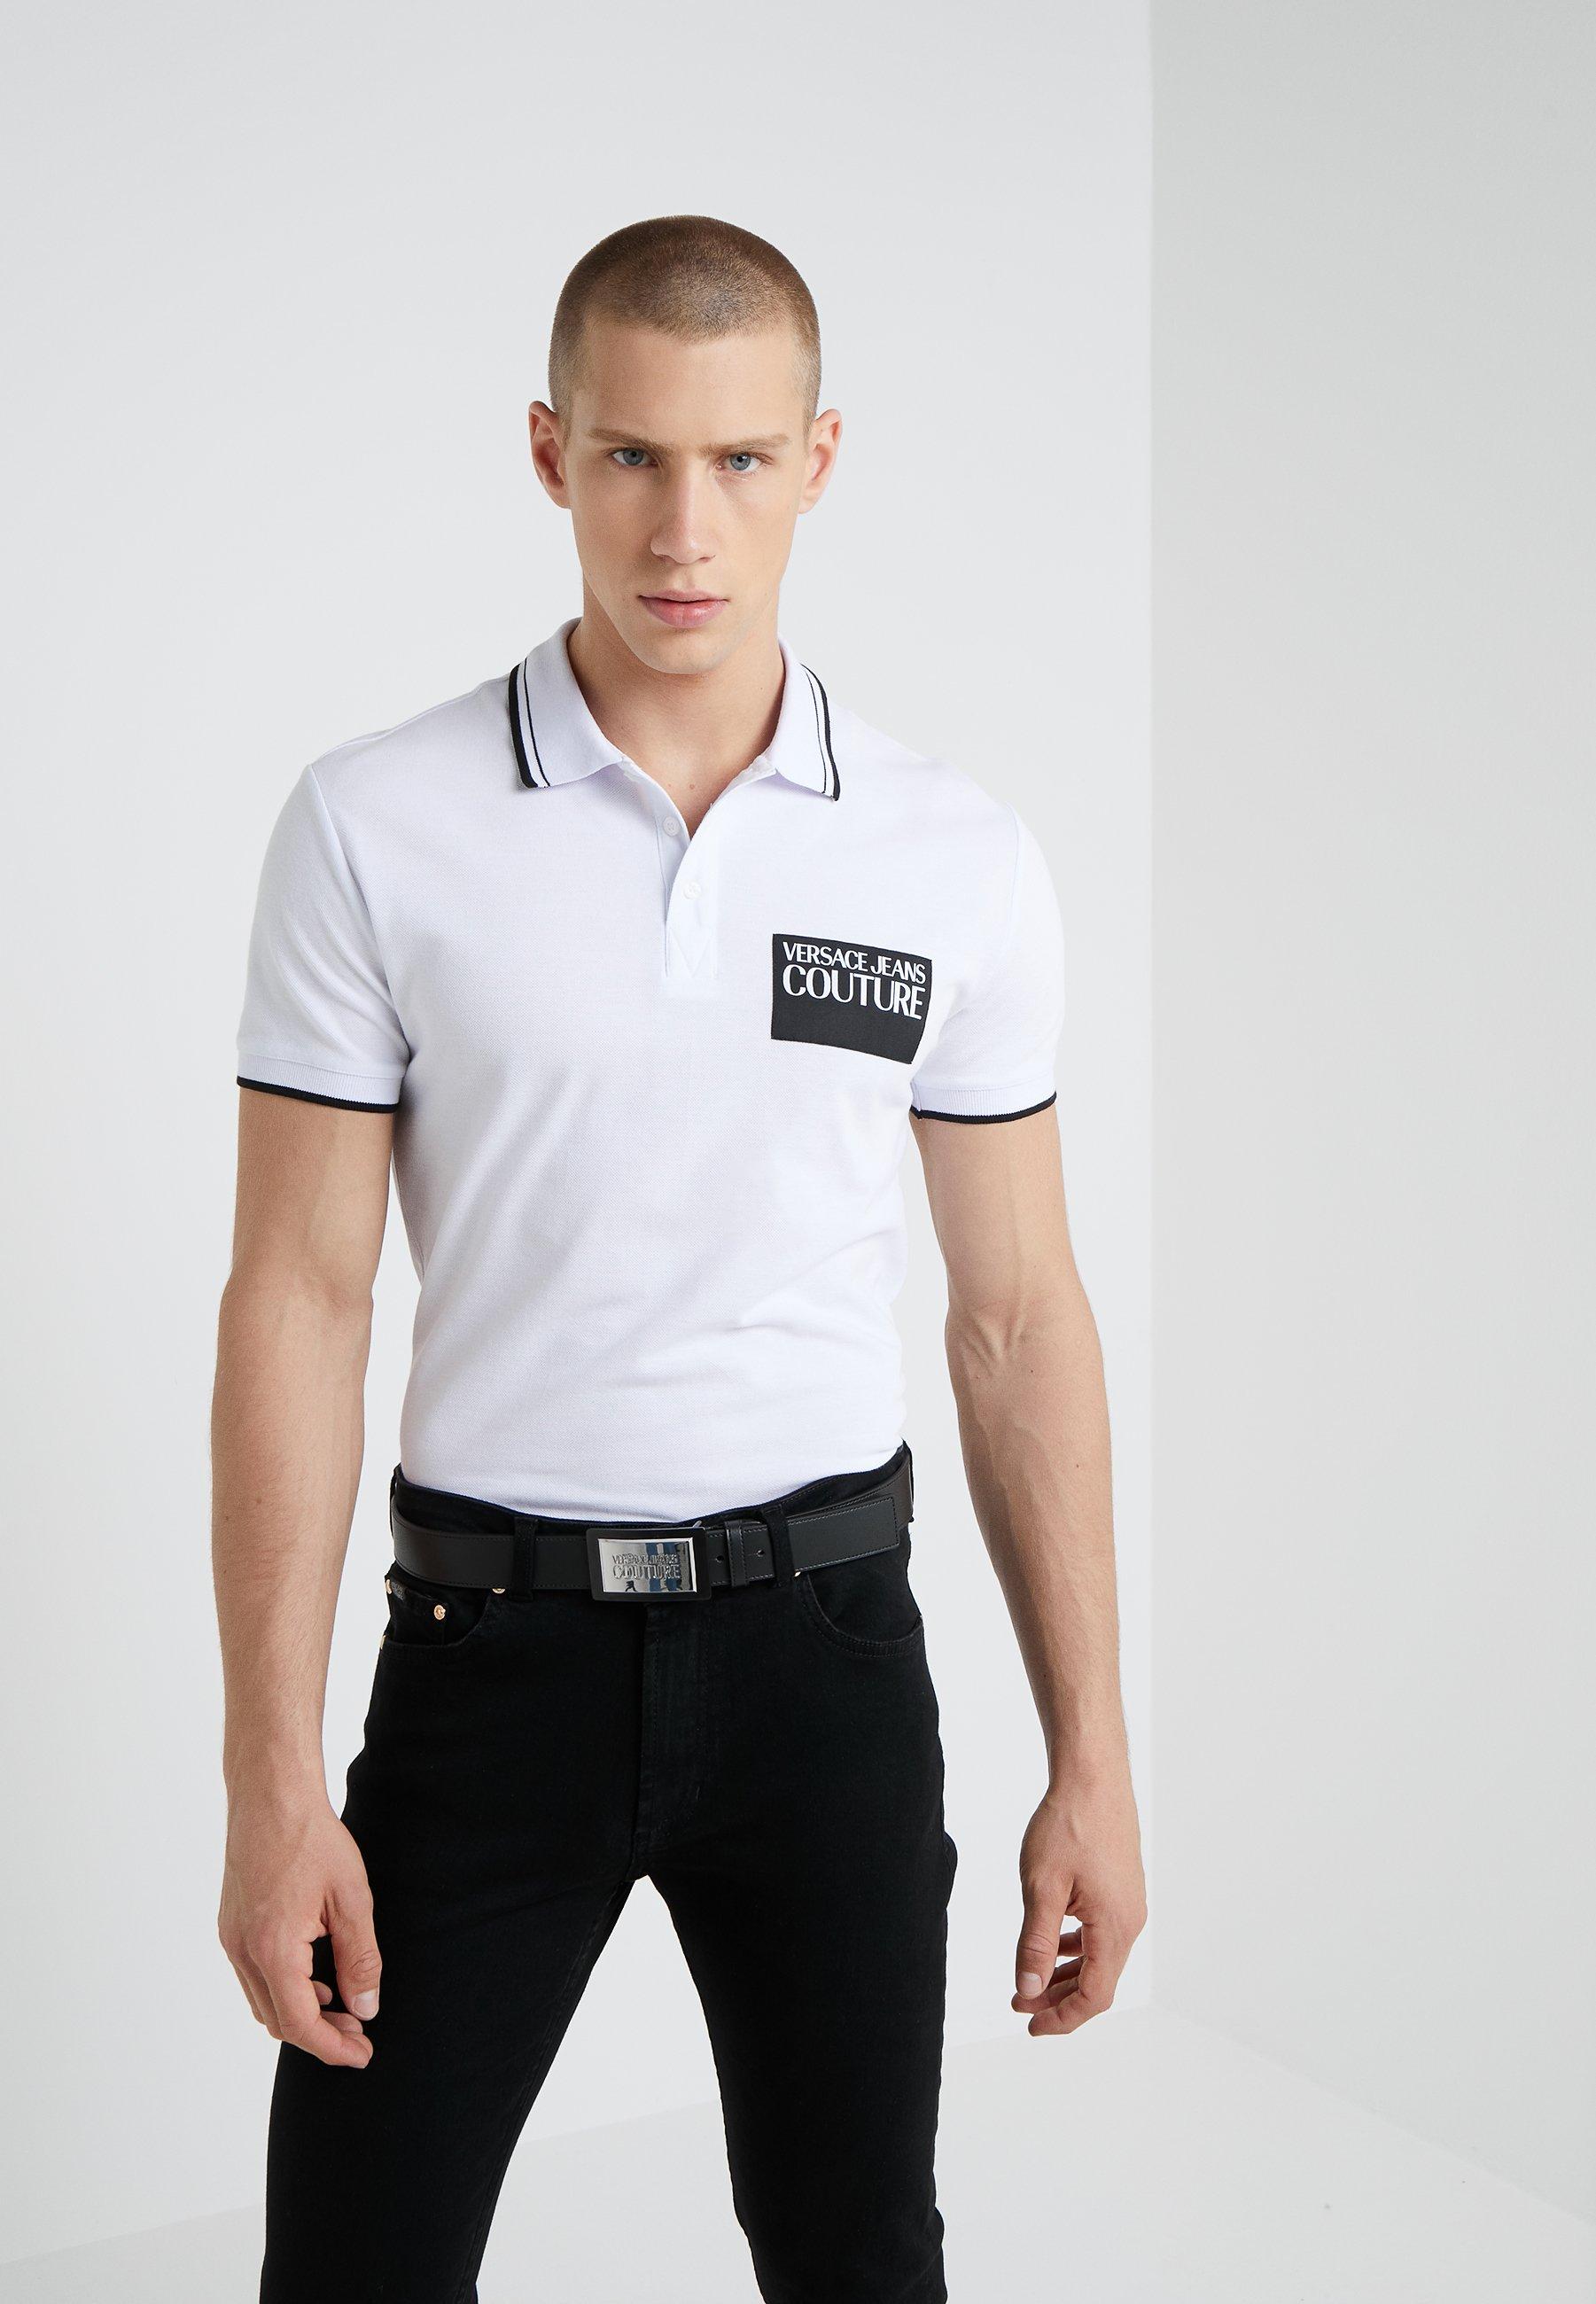 Jeans Jeans Ottico Jeans Couture Versace PoloBianco Versace Ottico Versace PoloBianco Couture Couture b6gfY7y